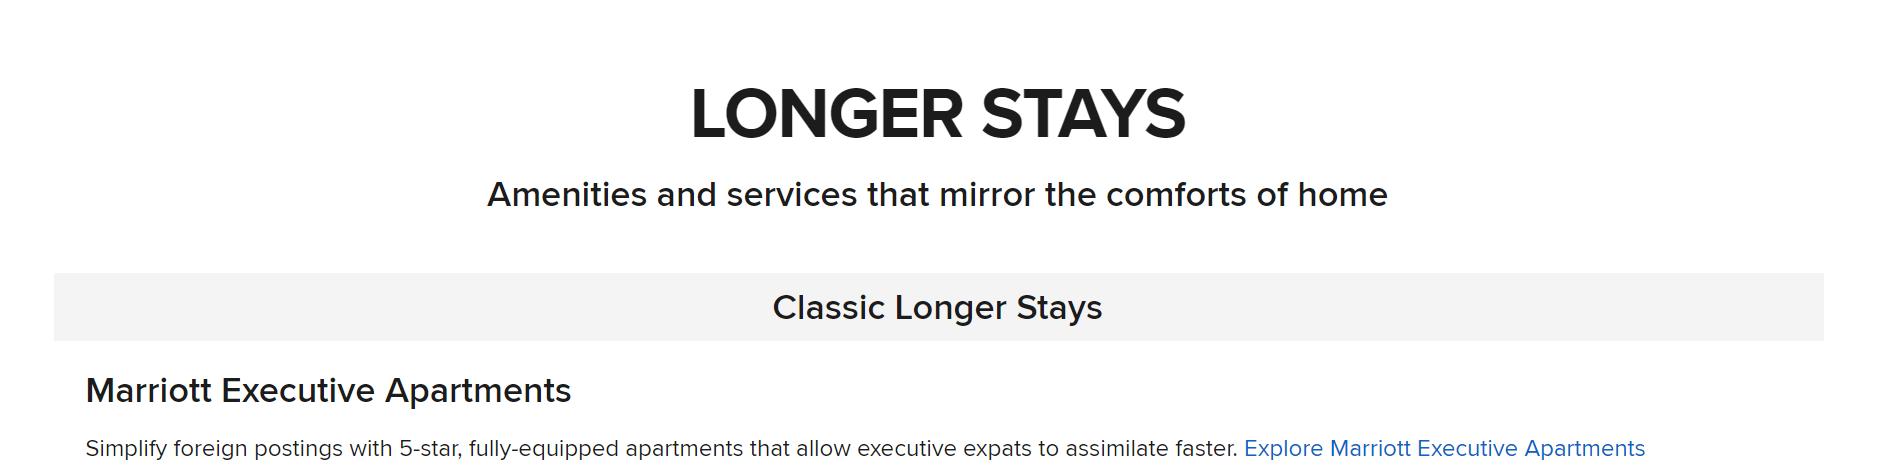 longer stay.PNG